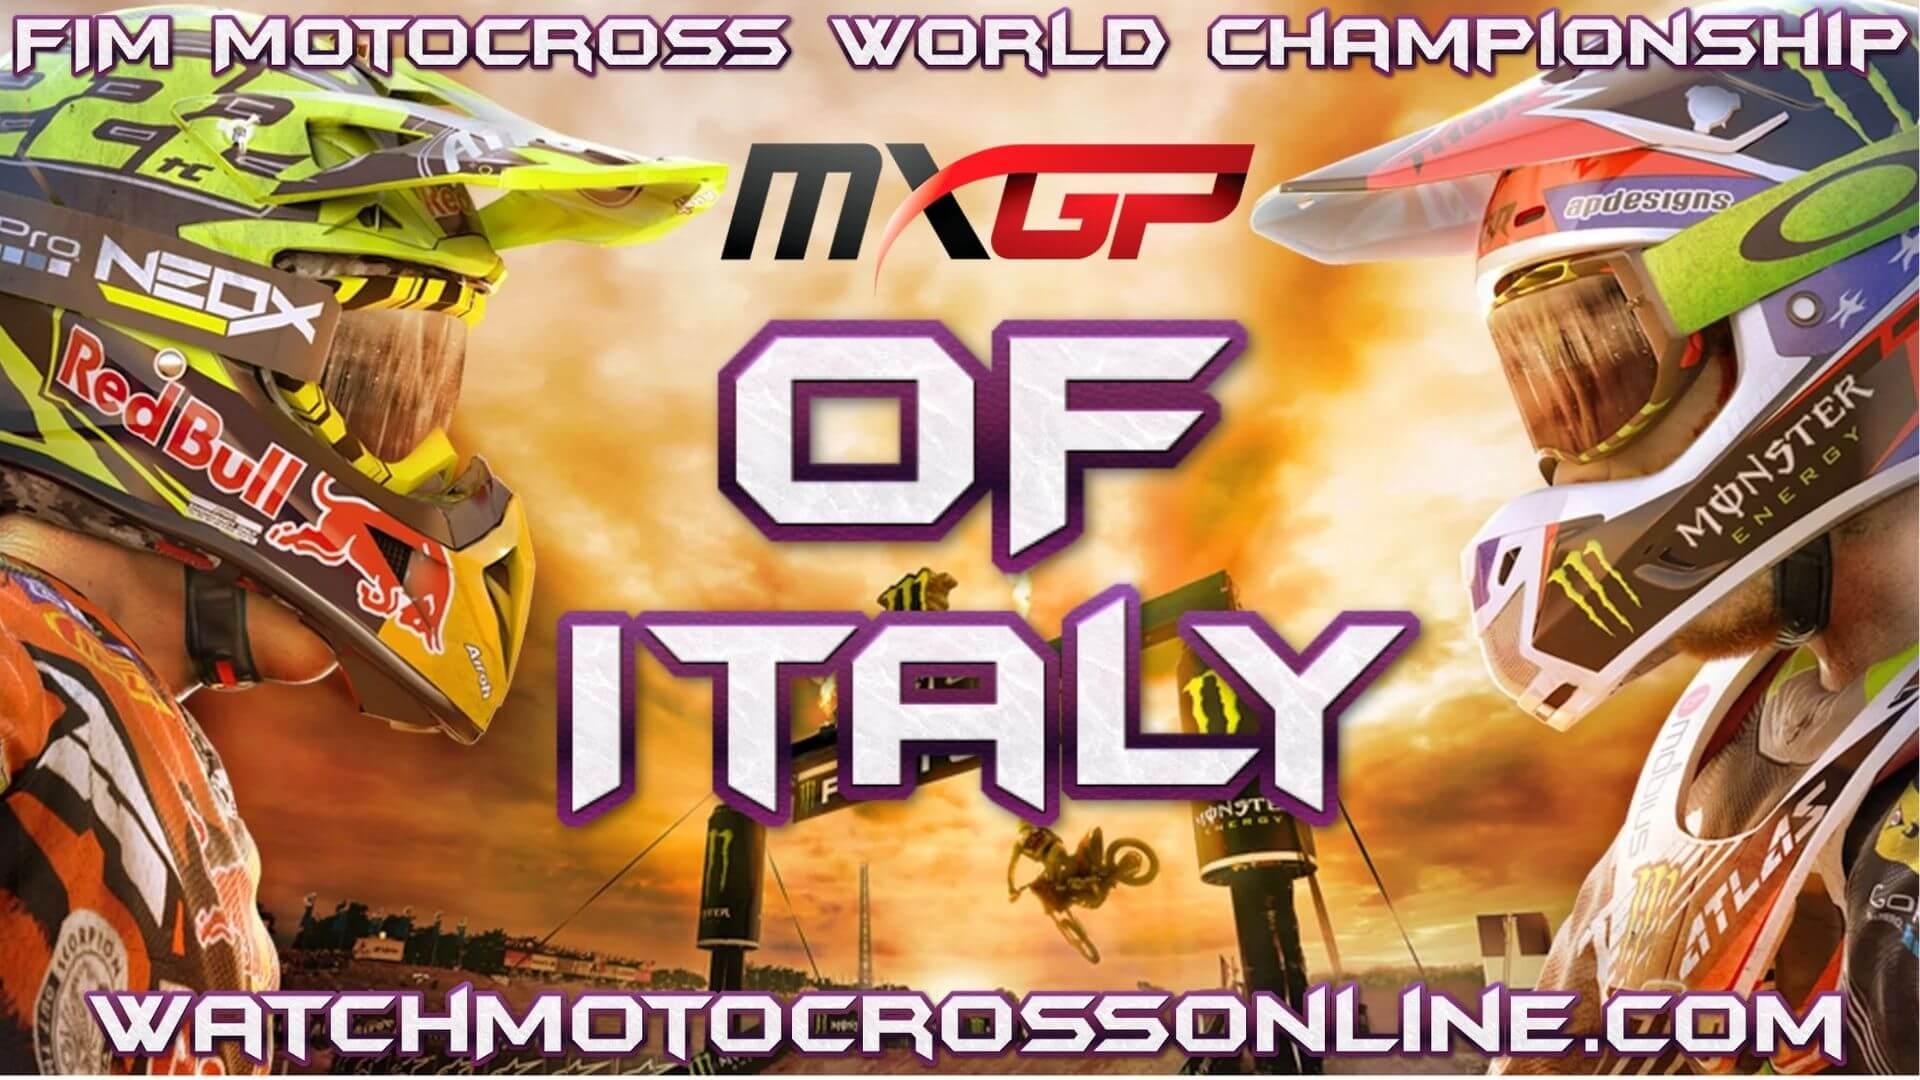 MXGP of Italy Live Stream 2020